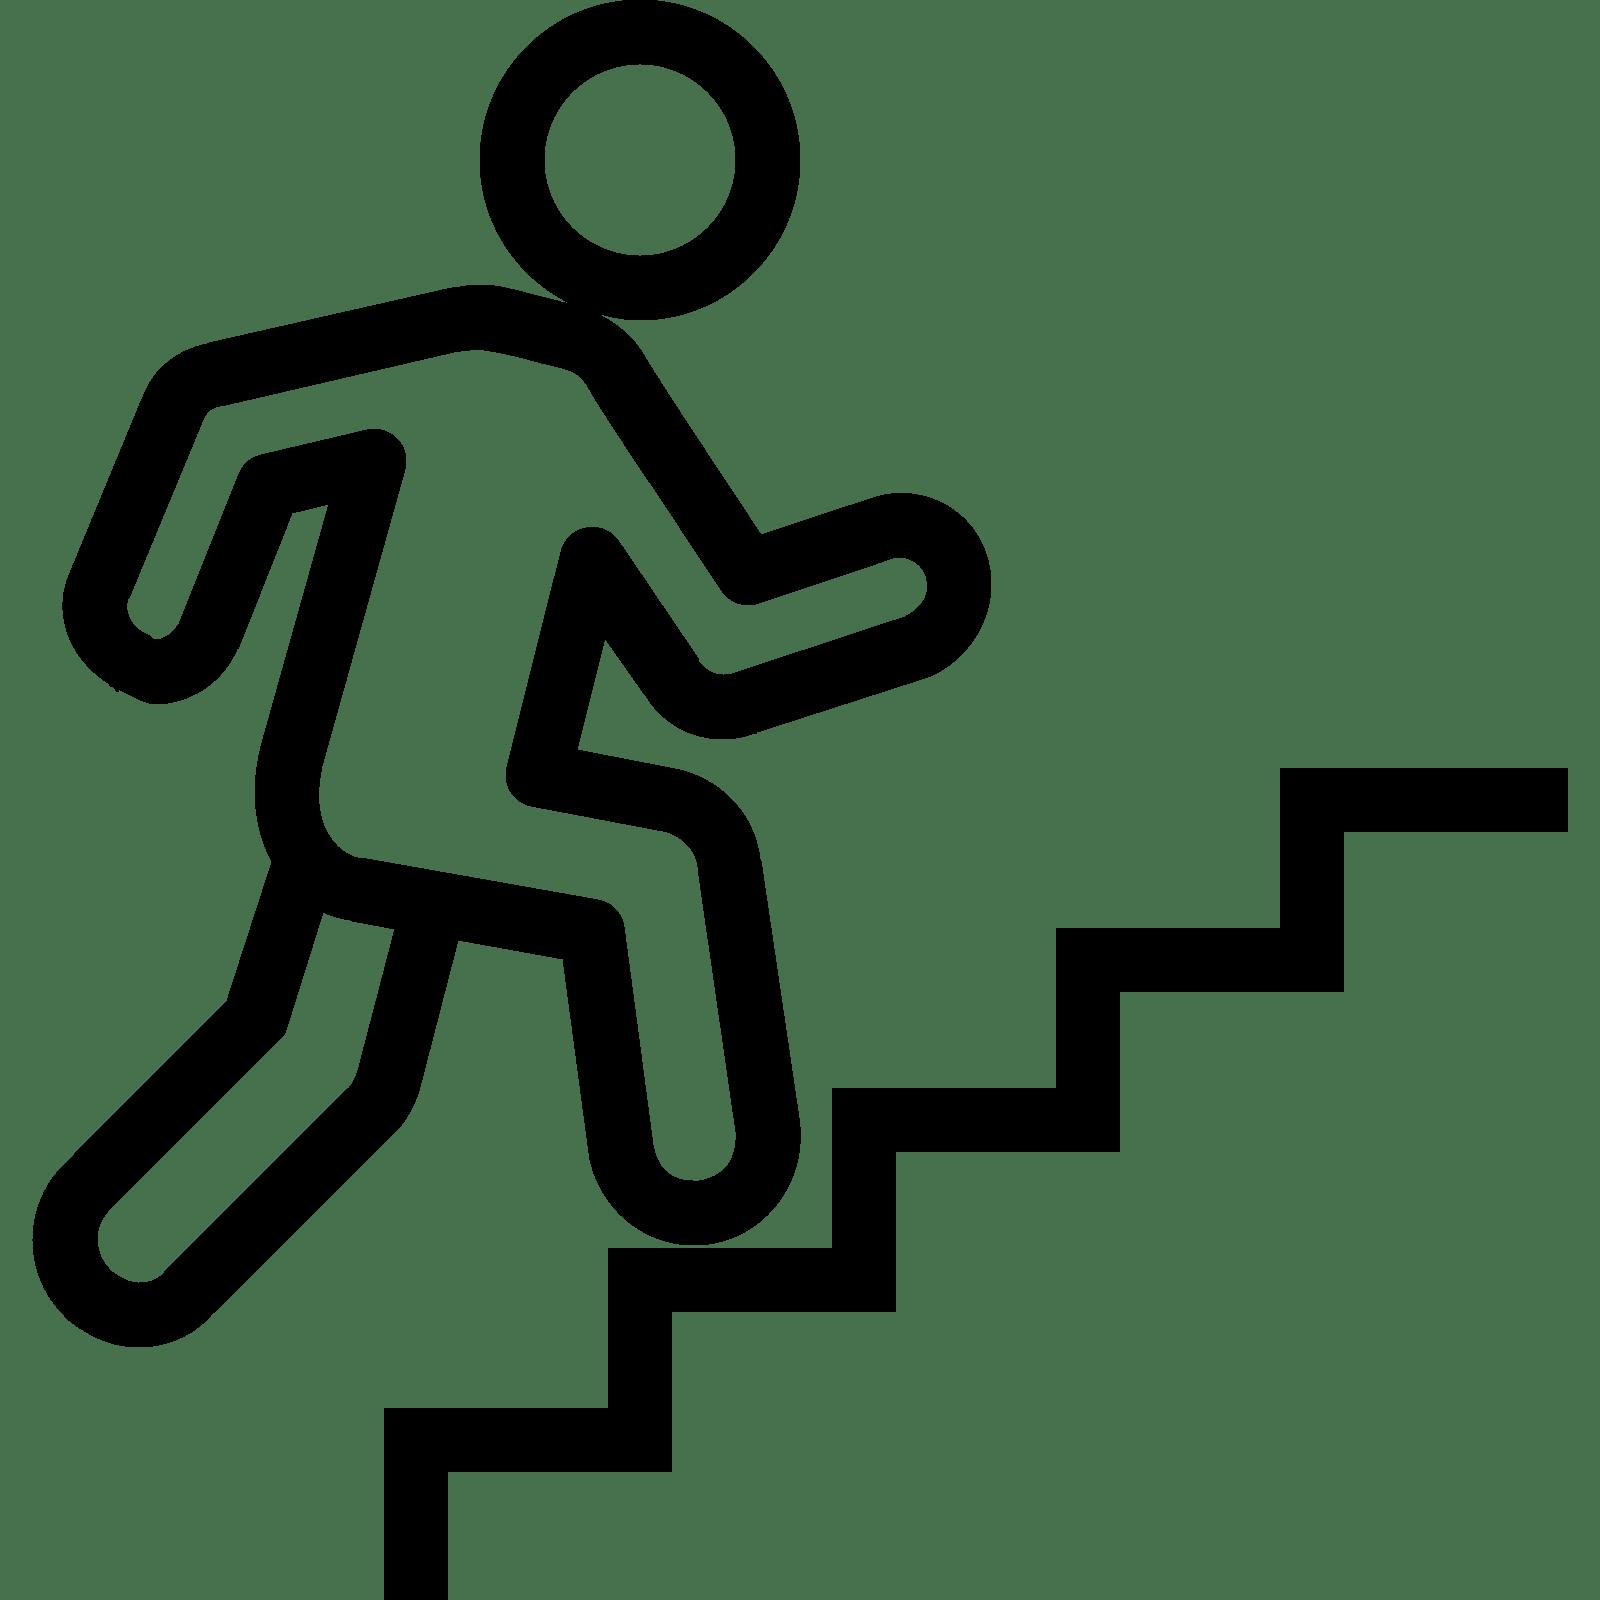 Escaleras Para Despertar Icono